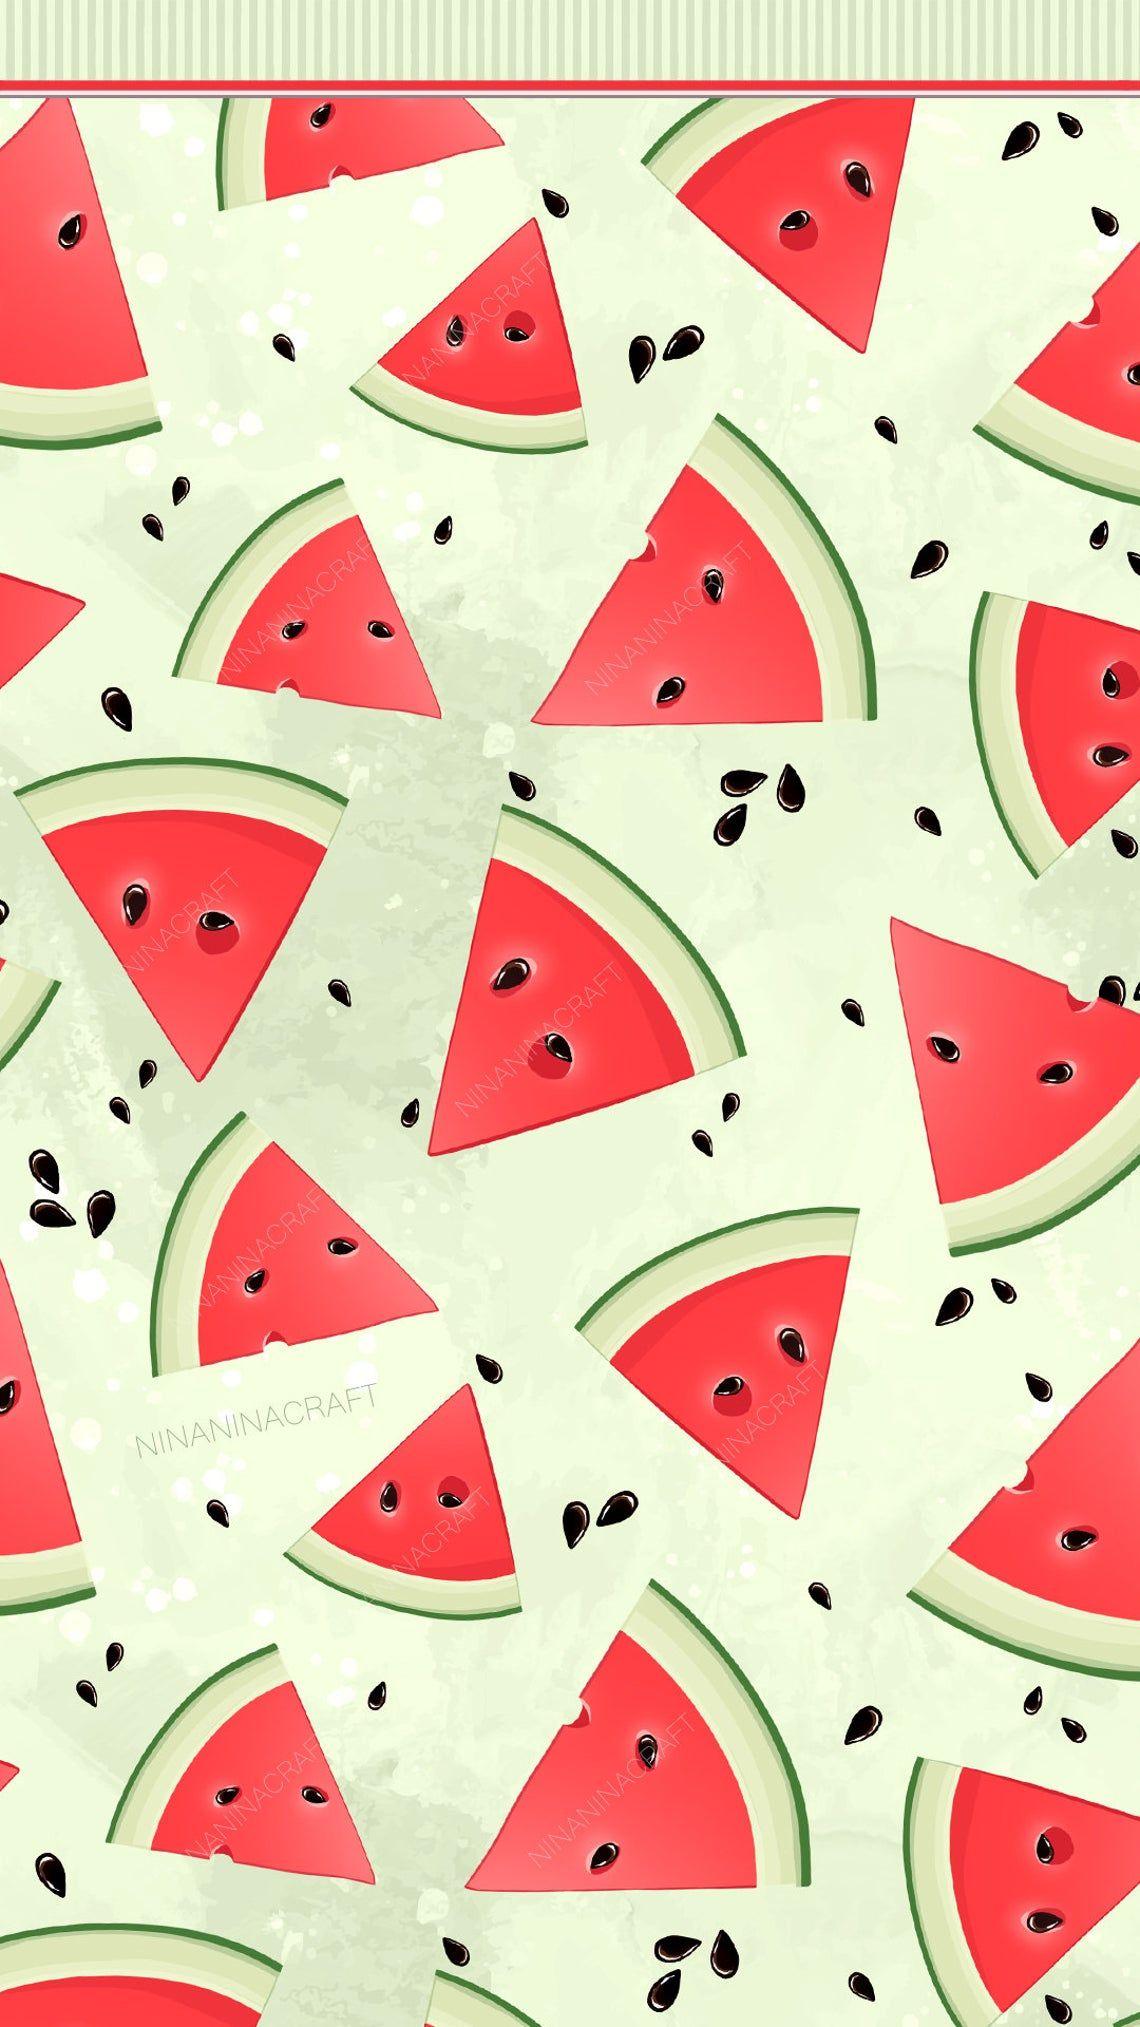 Watermelon Wallpaper Red Green Cute Watermelon Clip Art Watermelon Digital Etsy Ninaninacraft Watermelon Wallpaper Cute Patterns Wallpaper Cute Watermelon